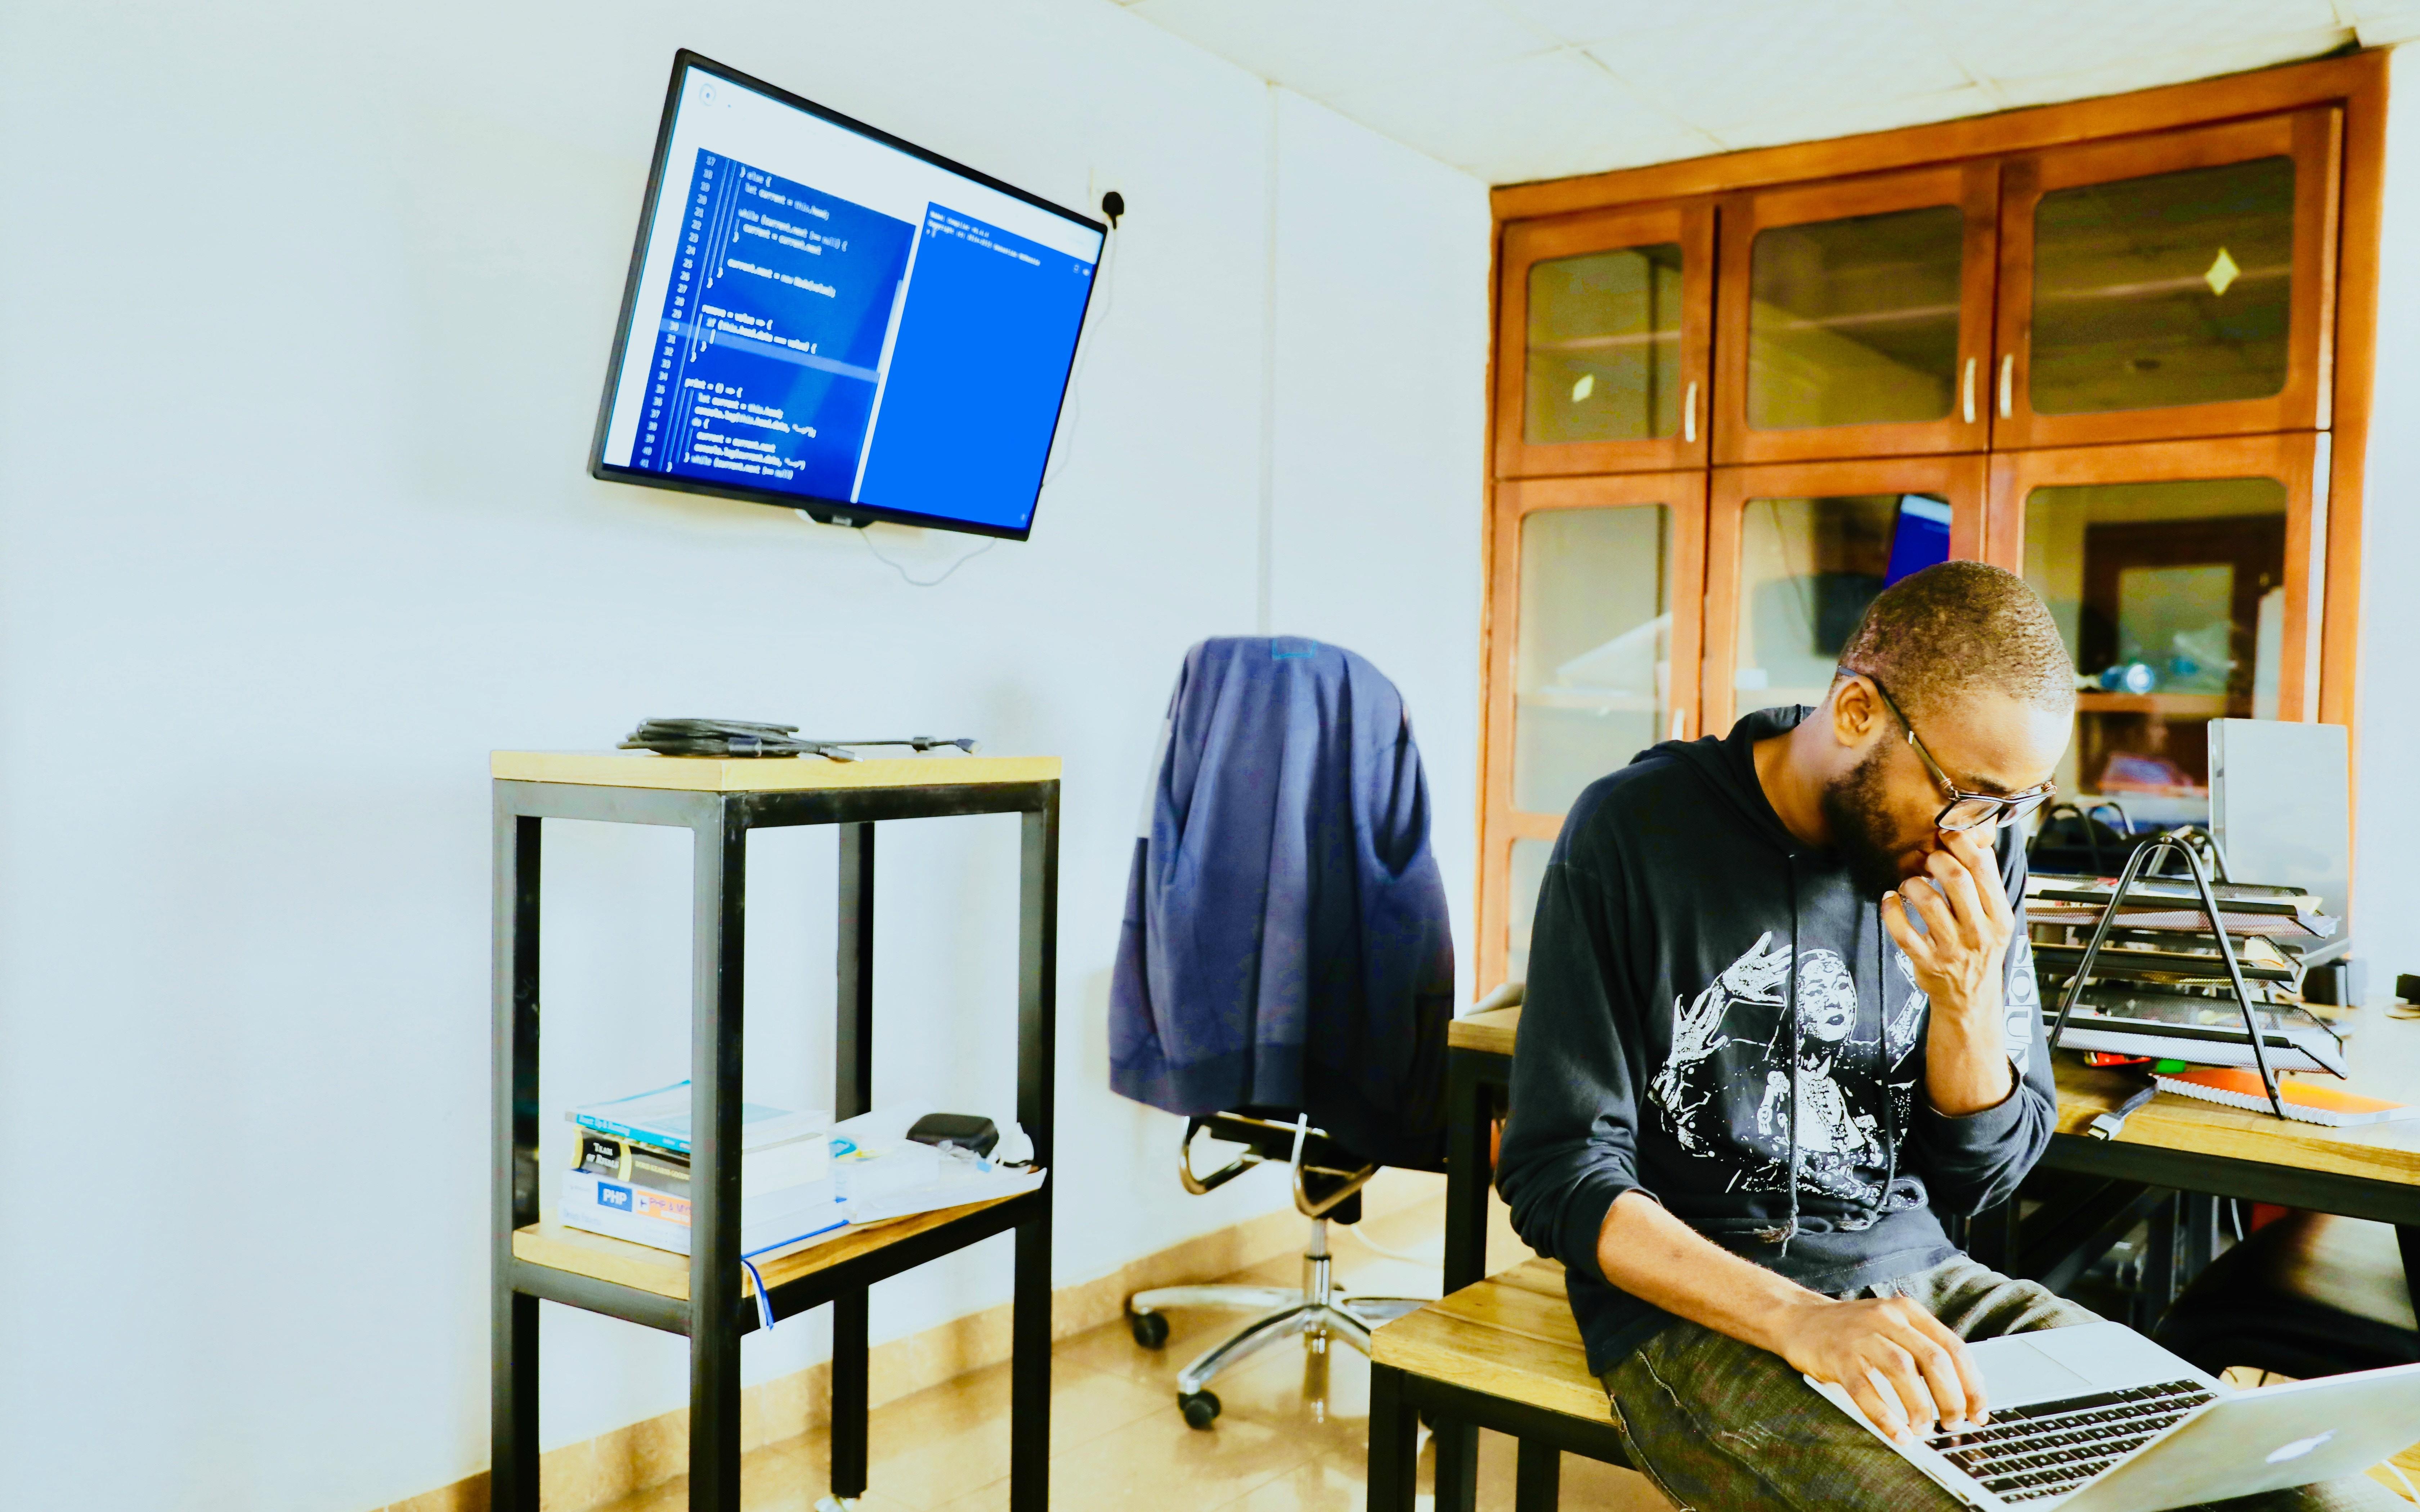 ASP NET Core: Using Highcharts With Angular 5 - DZone Web Dev